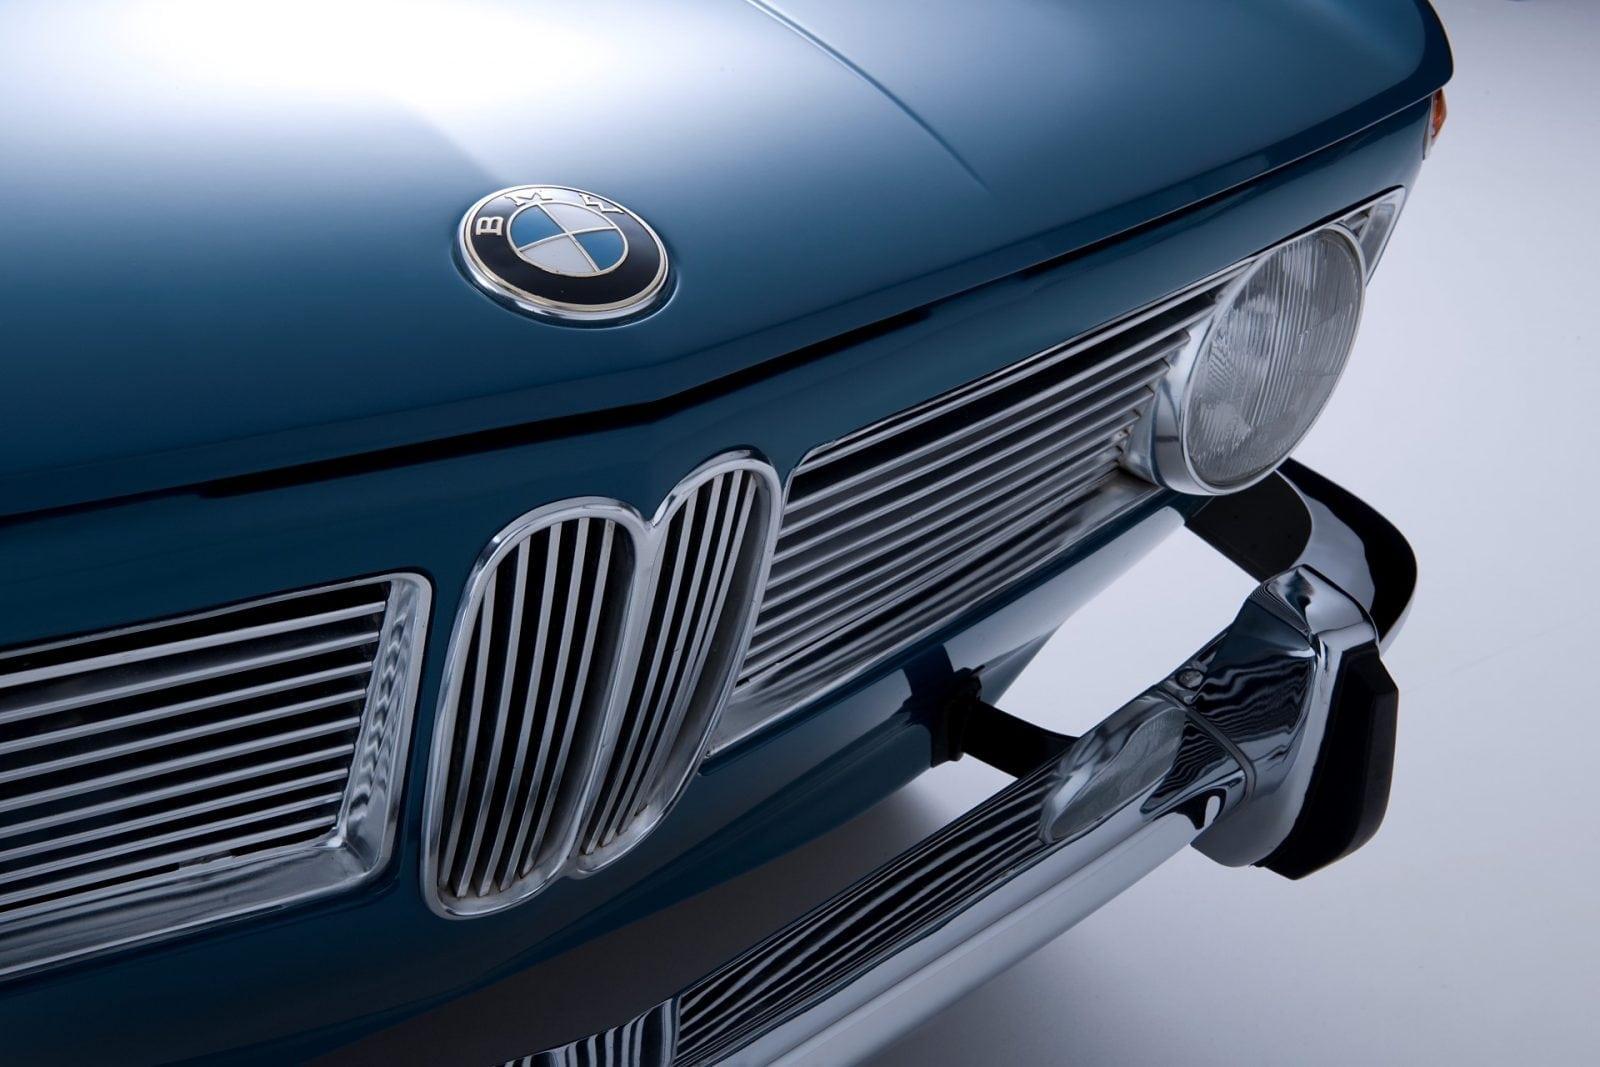 50 лет BMW New Class, BMW 1500 (03/2011)